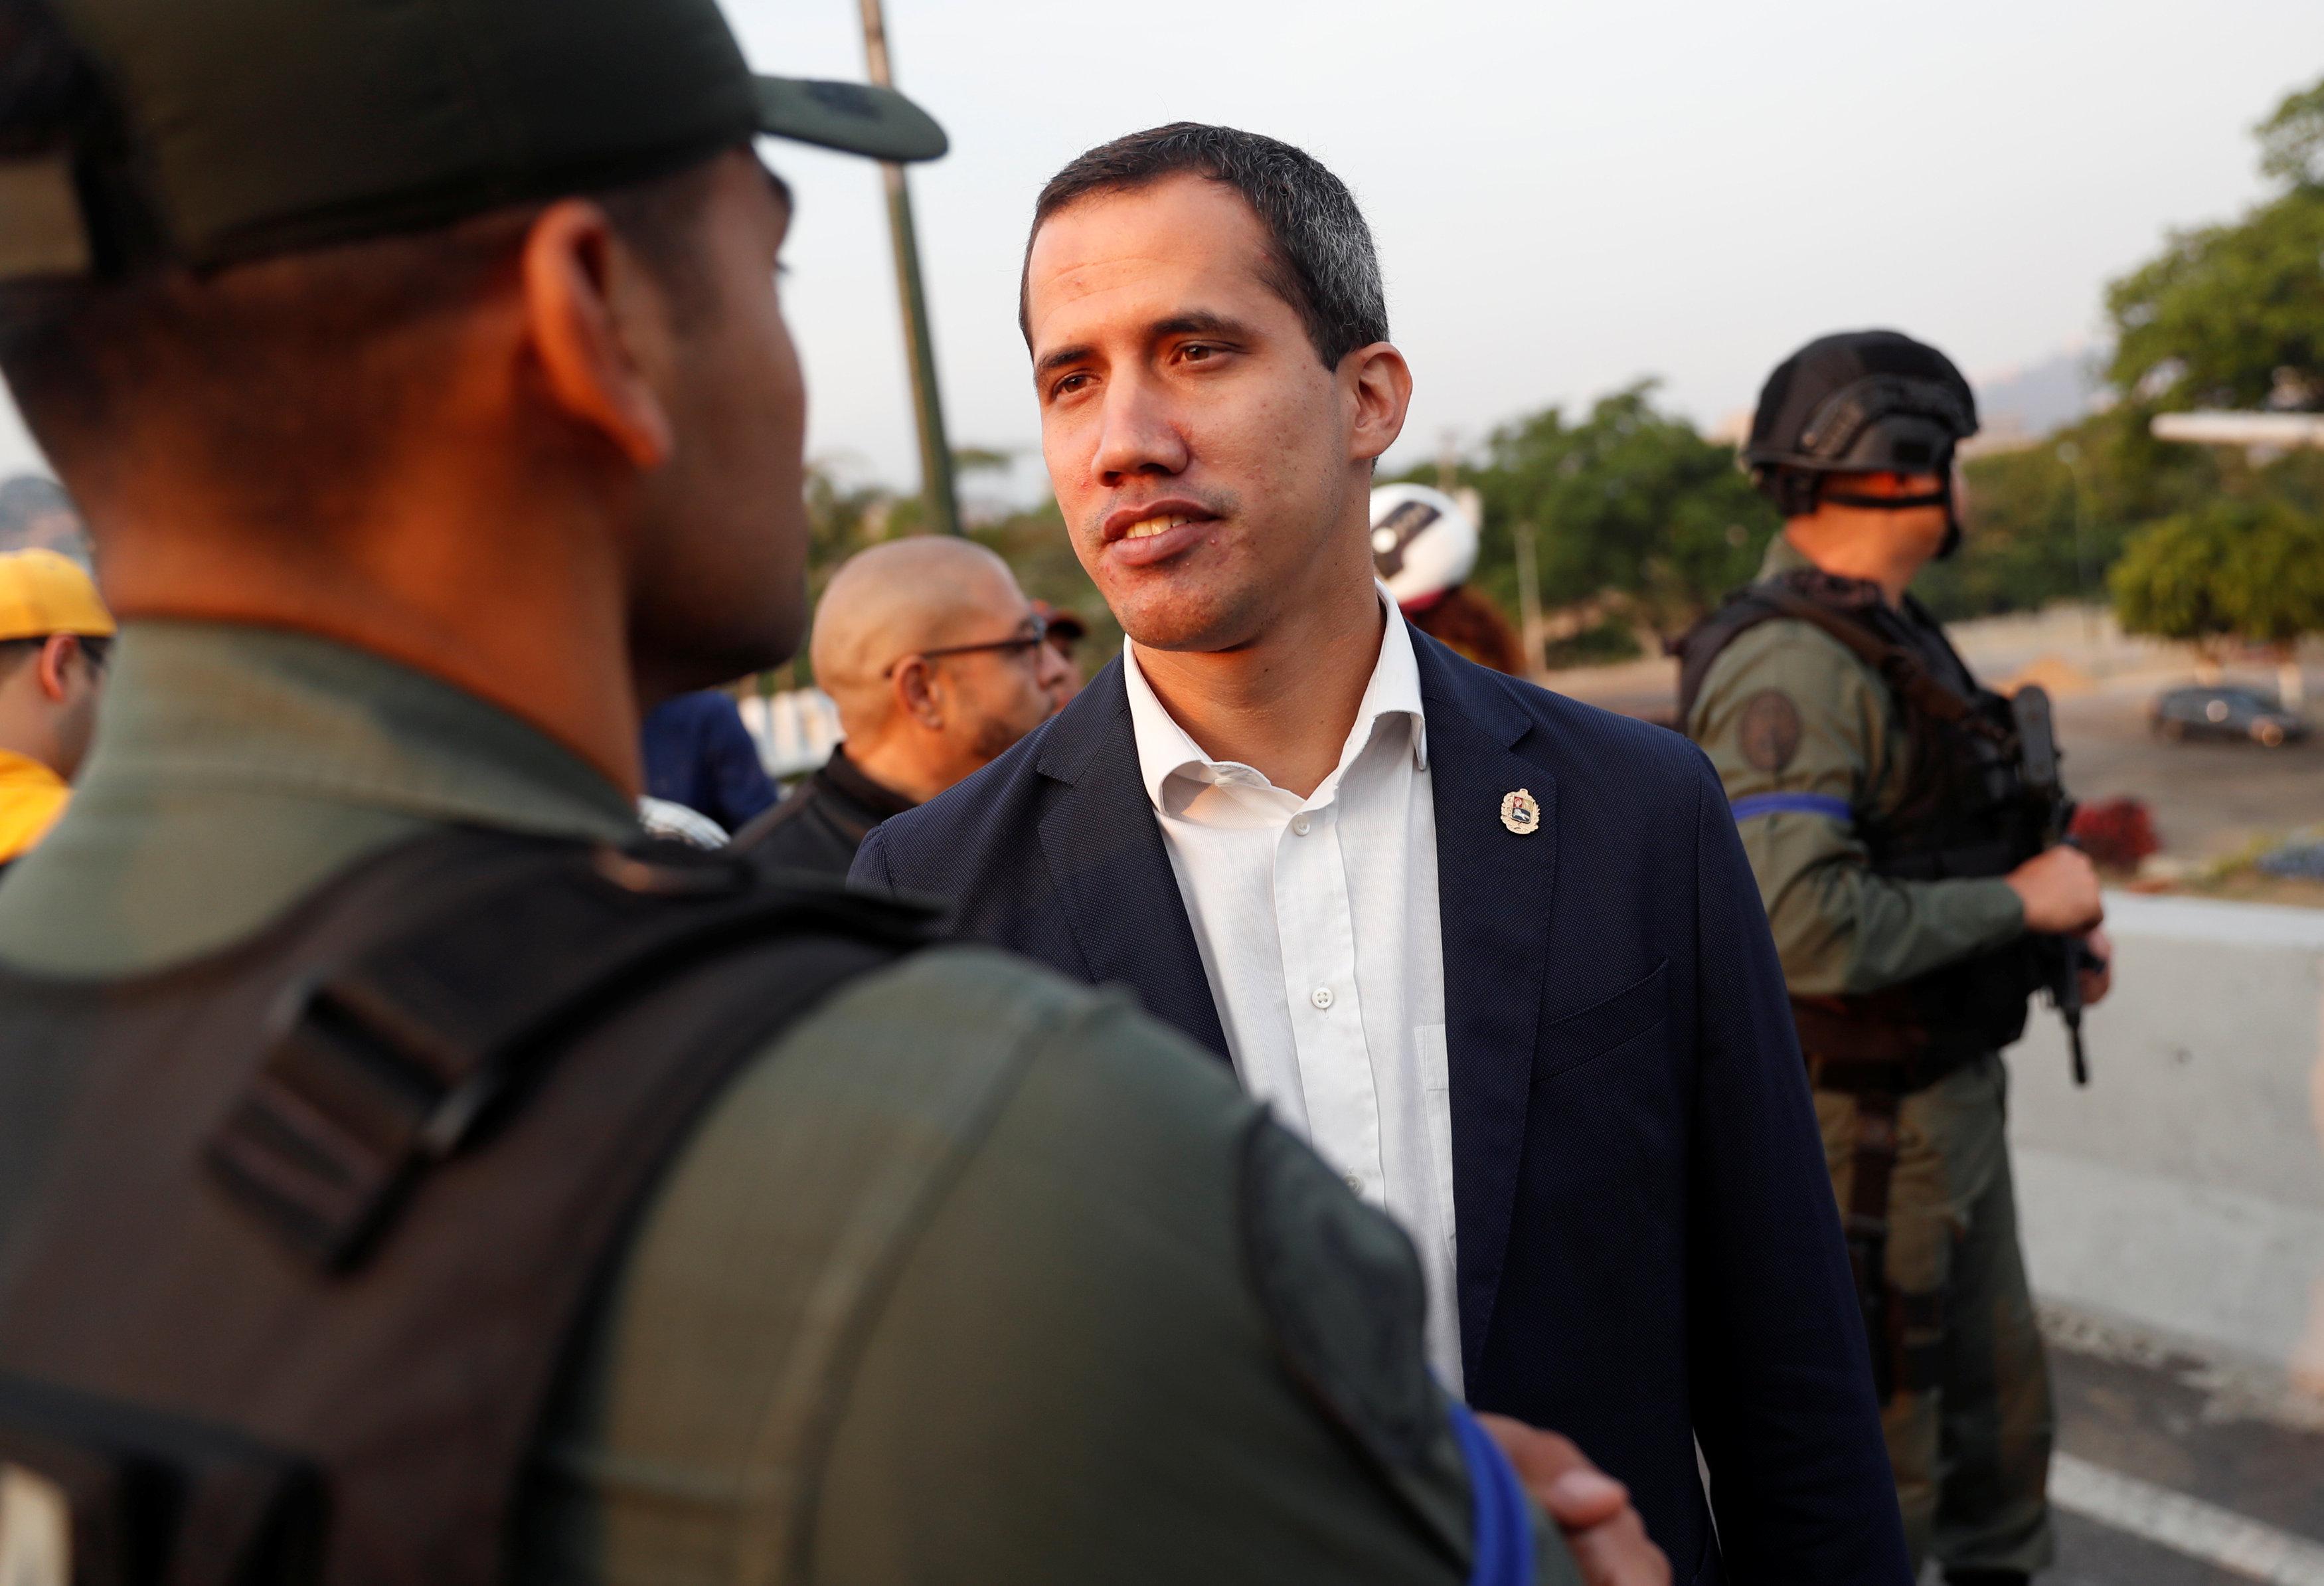 Video: Así llamó Guaidó a levantamiento militar en Venezuela